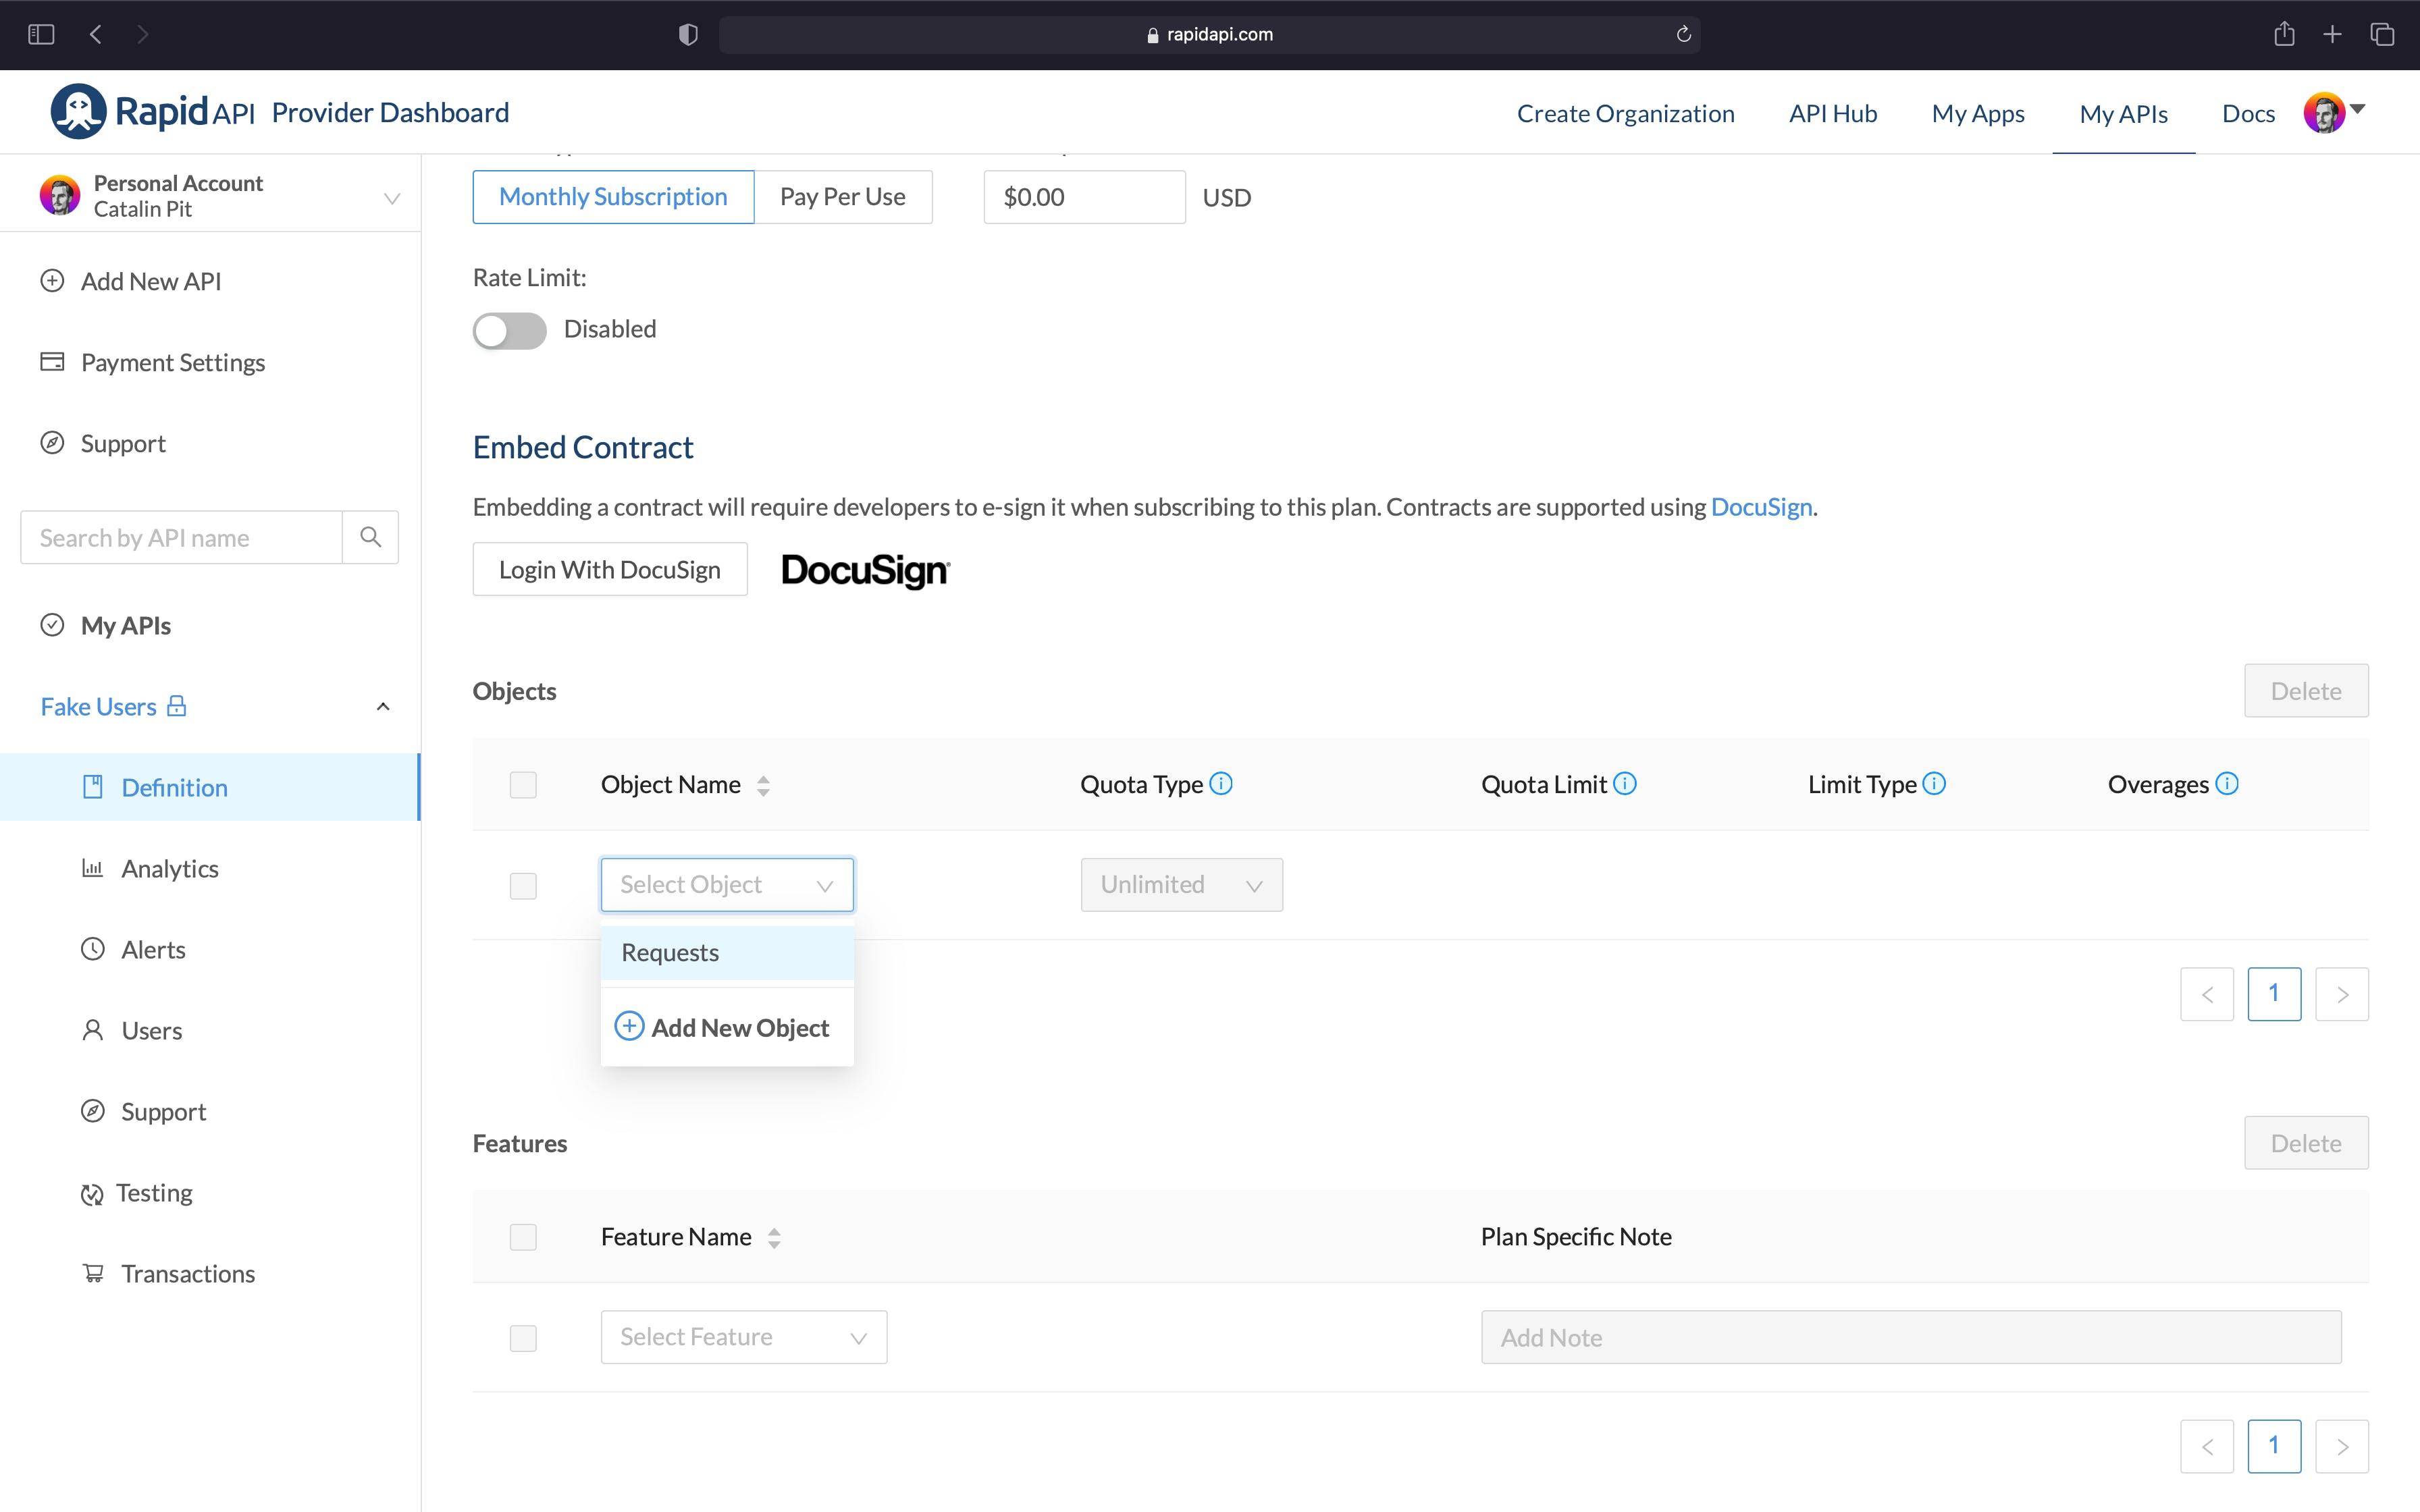 Setting the Pro Plan in RapidAPI Dashboard